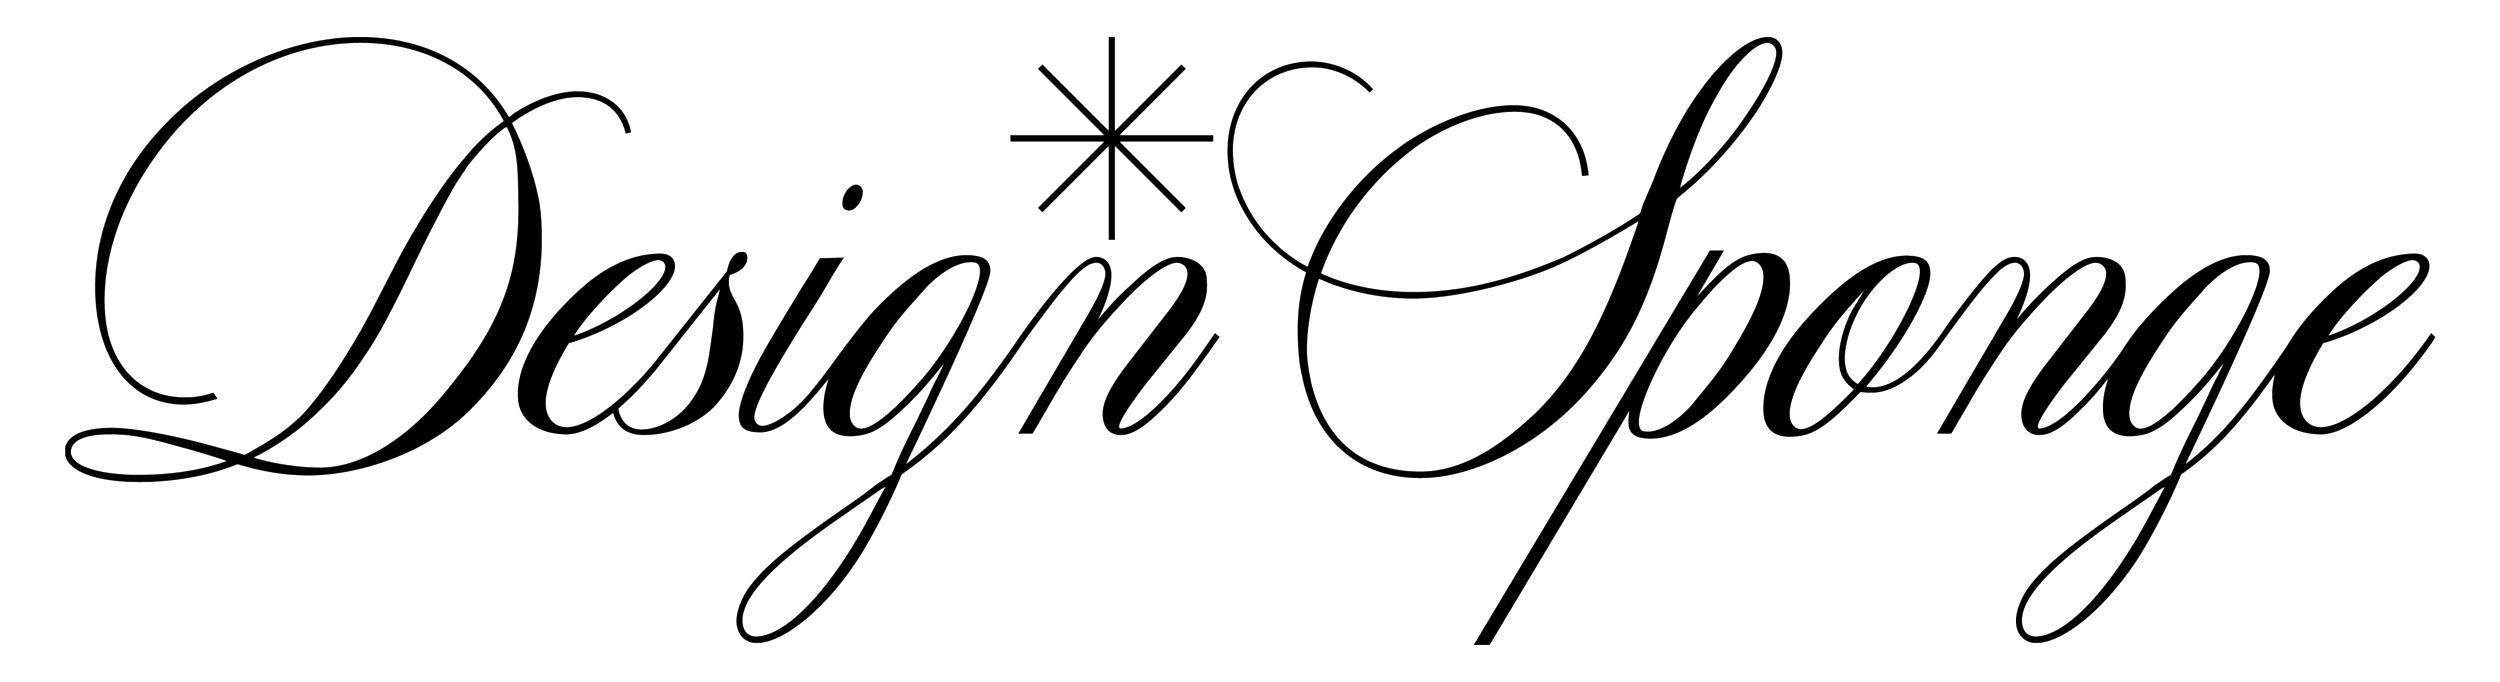 designspongelogo.png